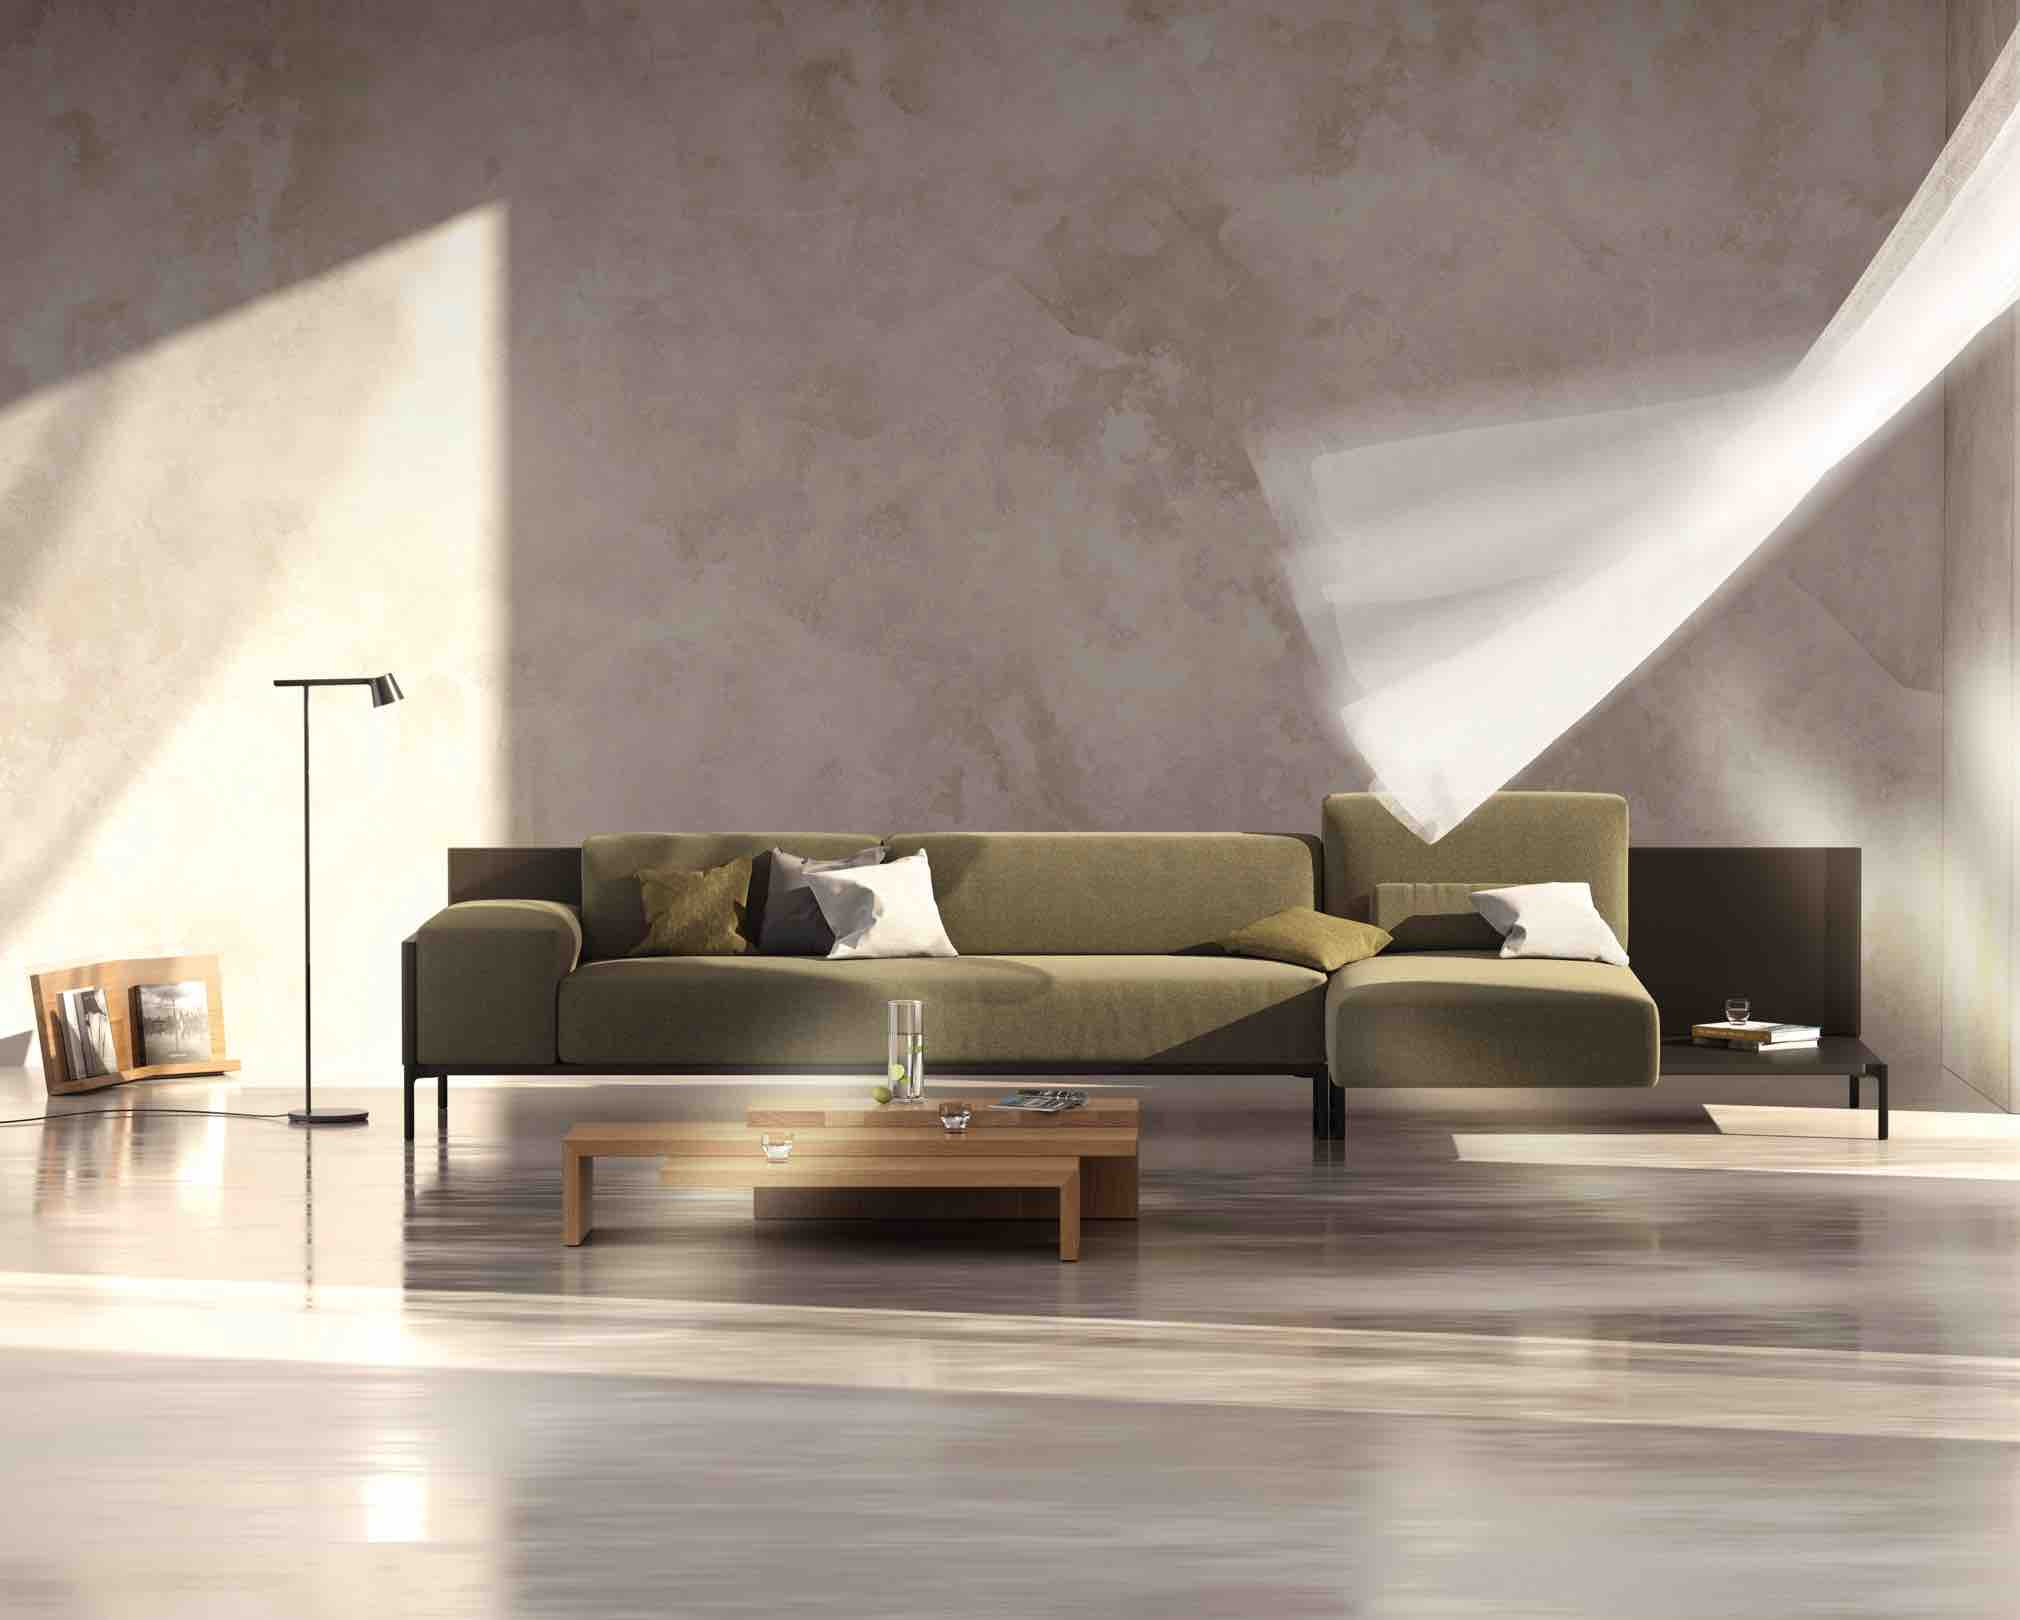 Indera Ninove Snooze sofa August